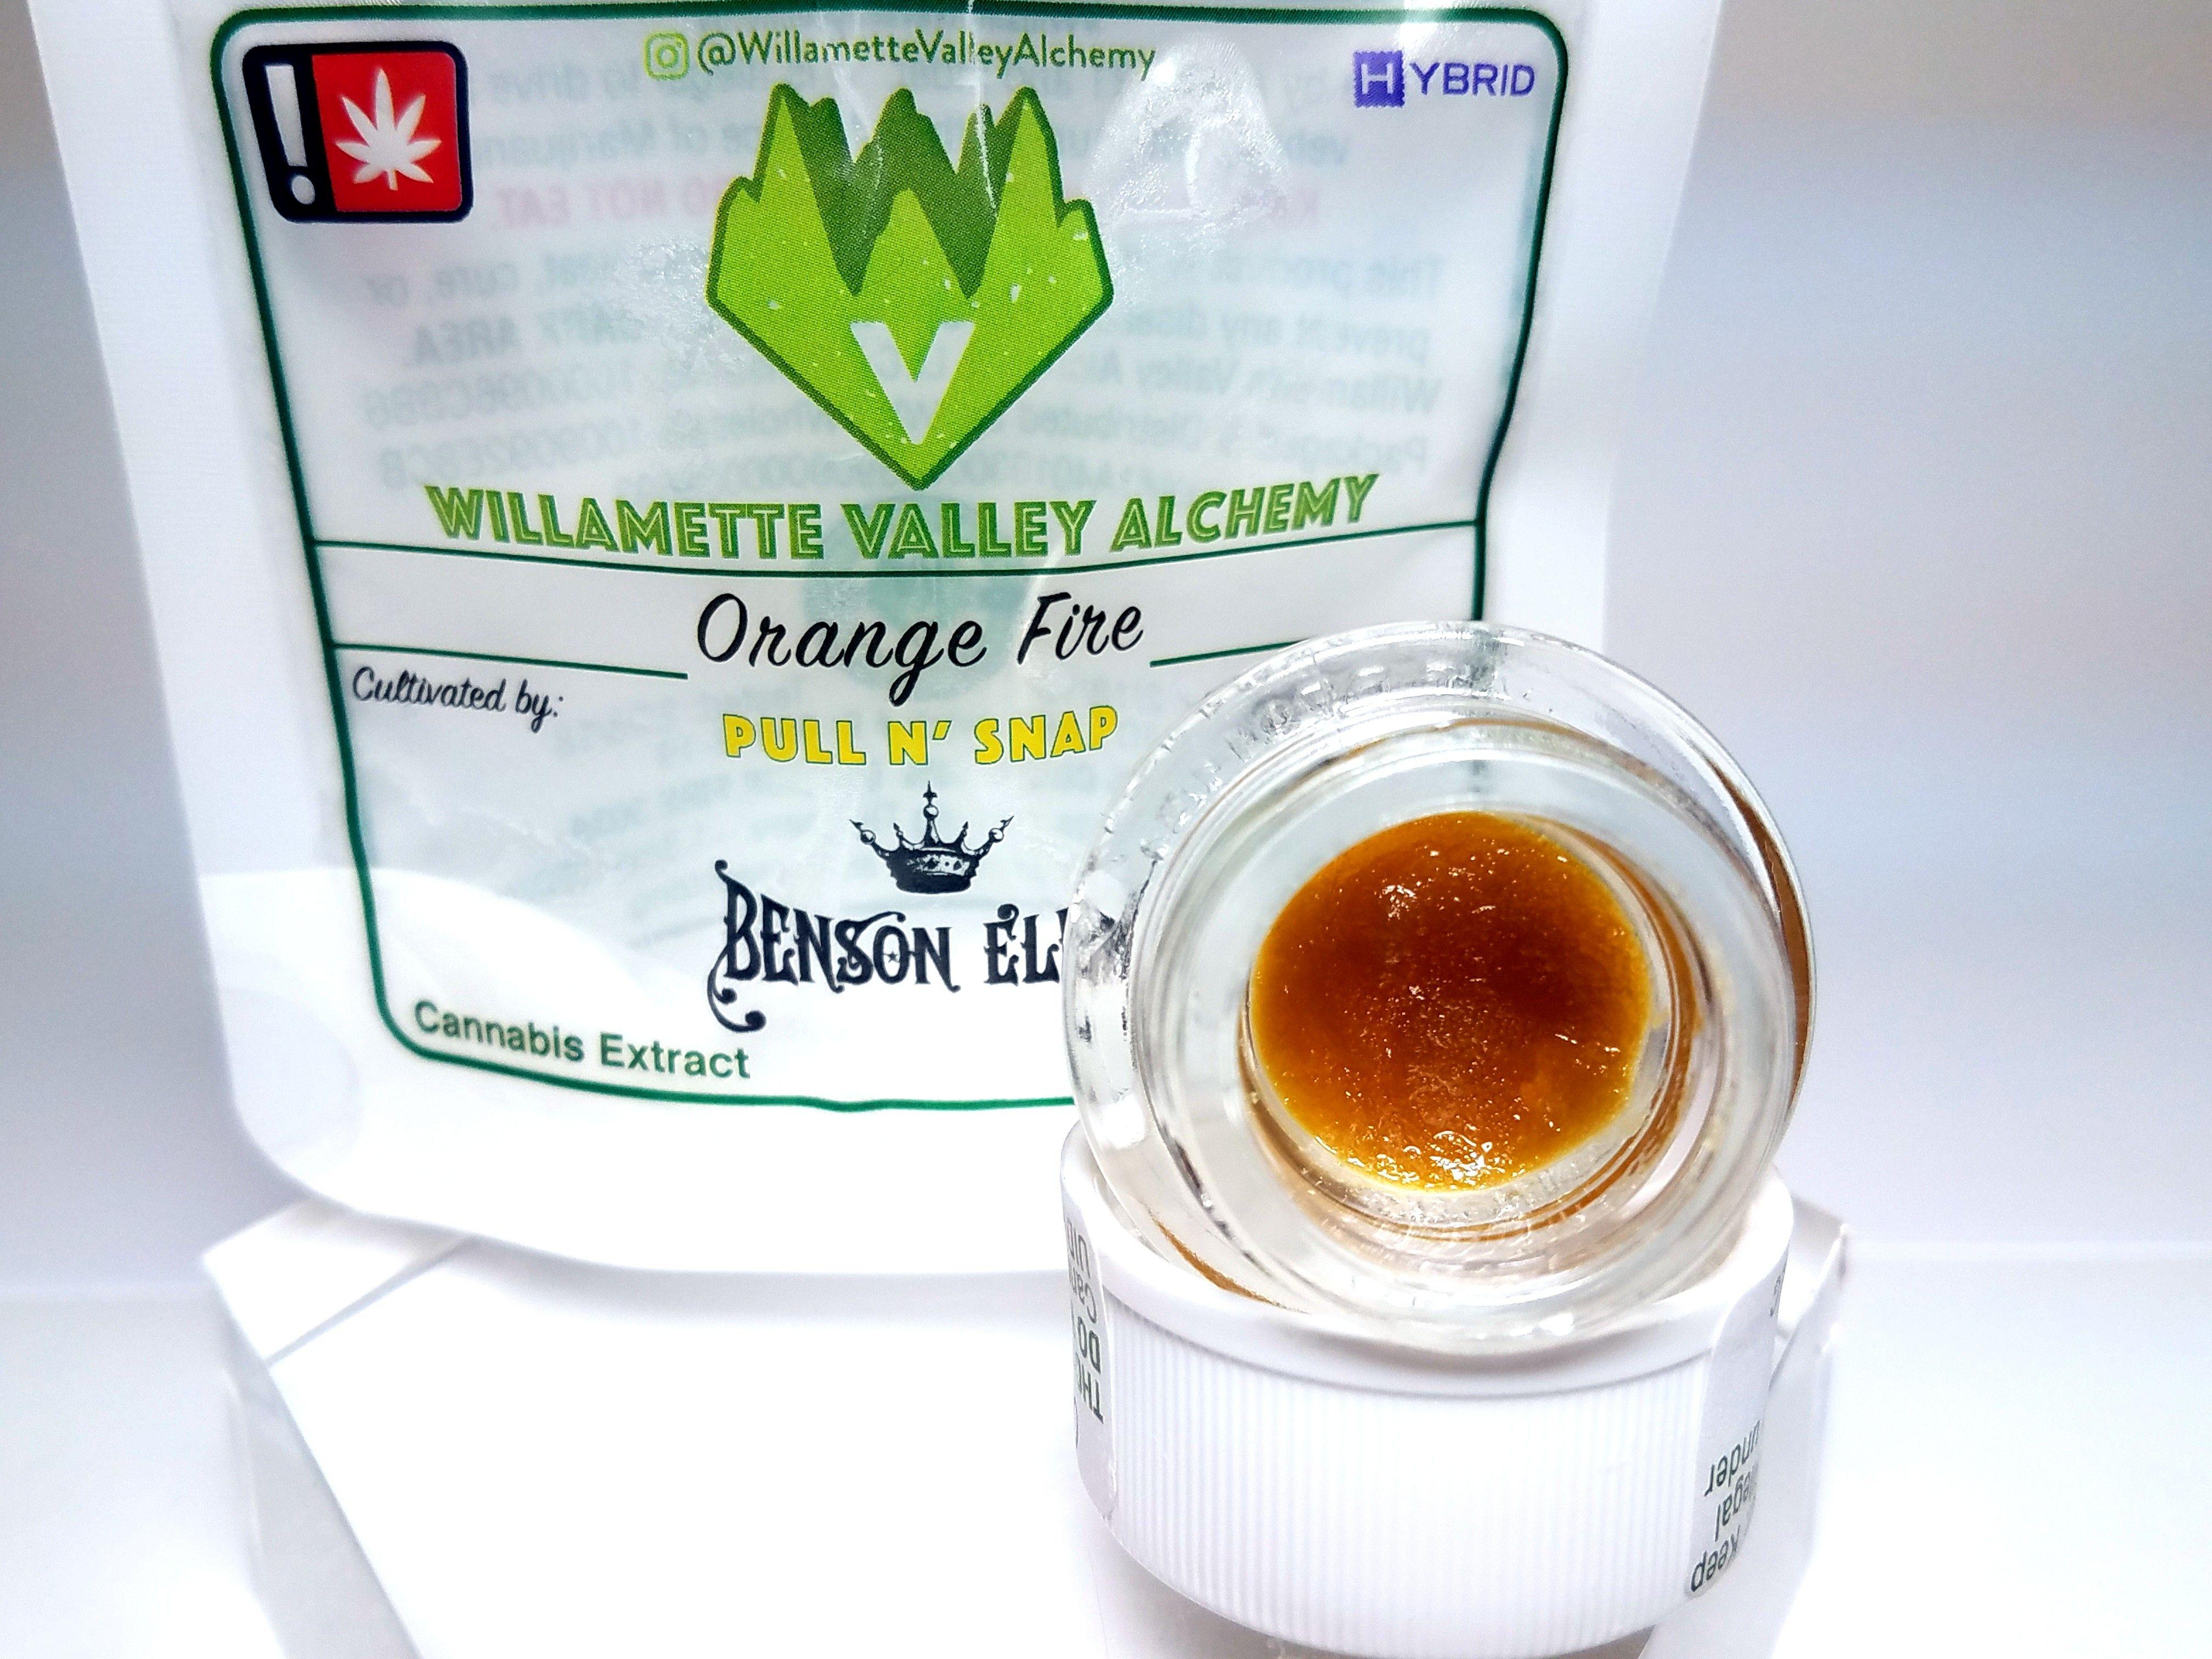 WVA - Orange Fire, Hybrid, Sugar Sauce